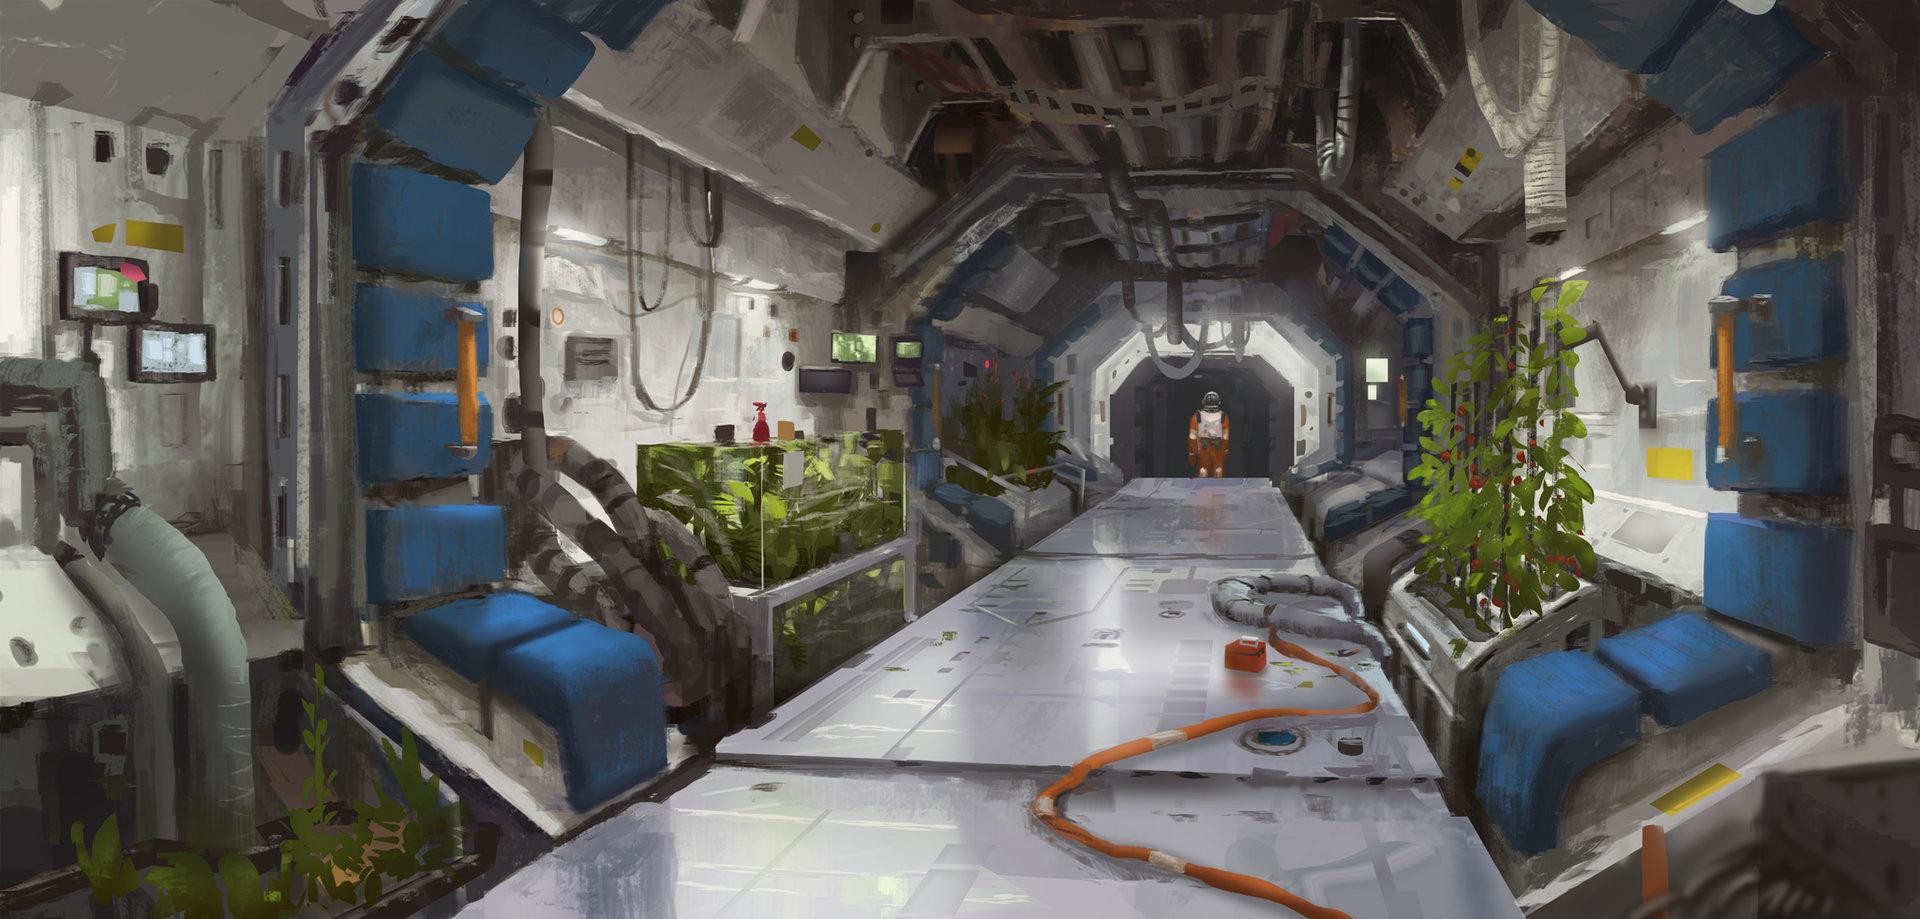 Space station Corridor 01